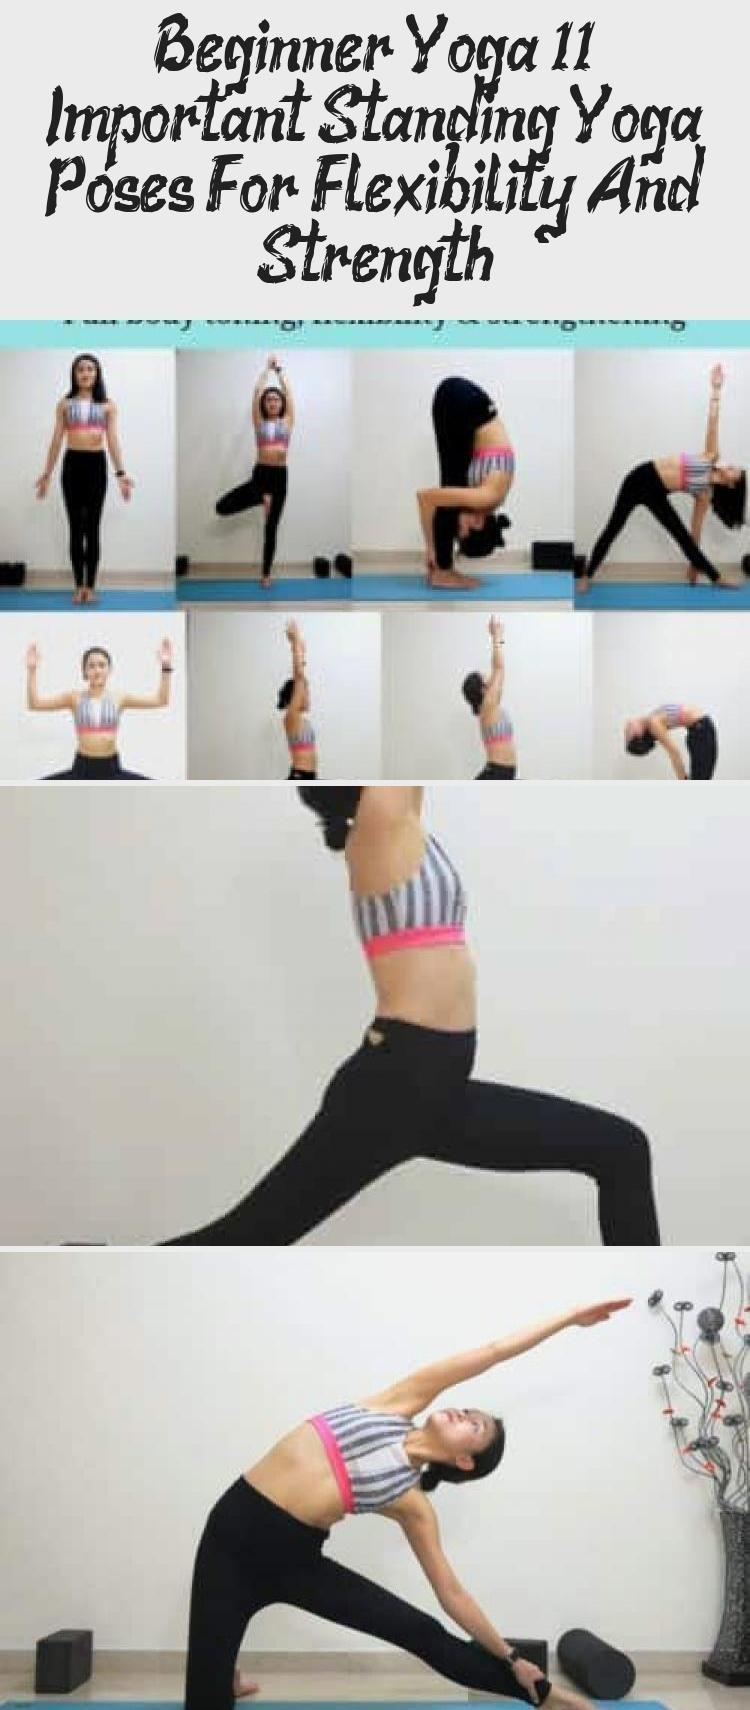 Beginner Yoga 11 Important Standing Yoga Poses For Flexibility And Strength St Beginner Yoga In 2020 Yoga For Beginners Standing Yoga Poses Yoga For Flexibility